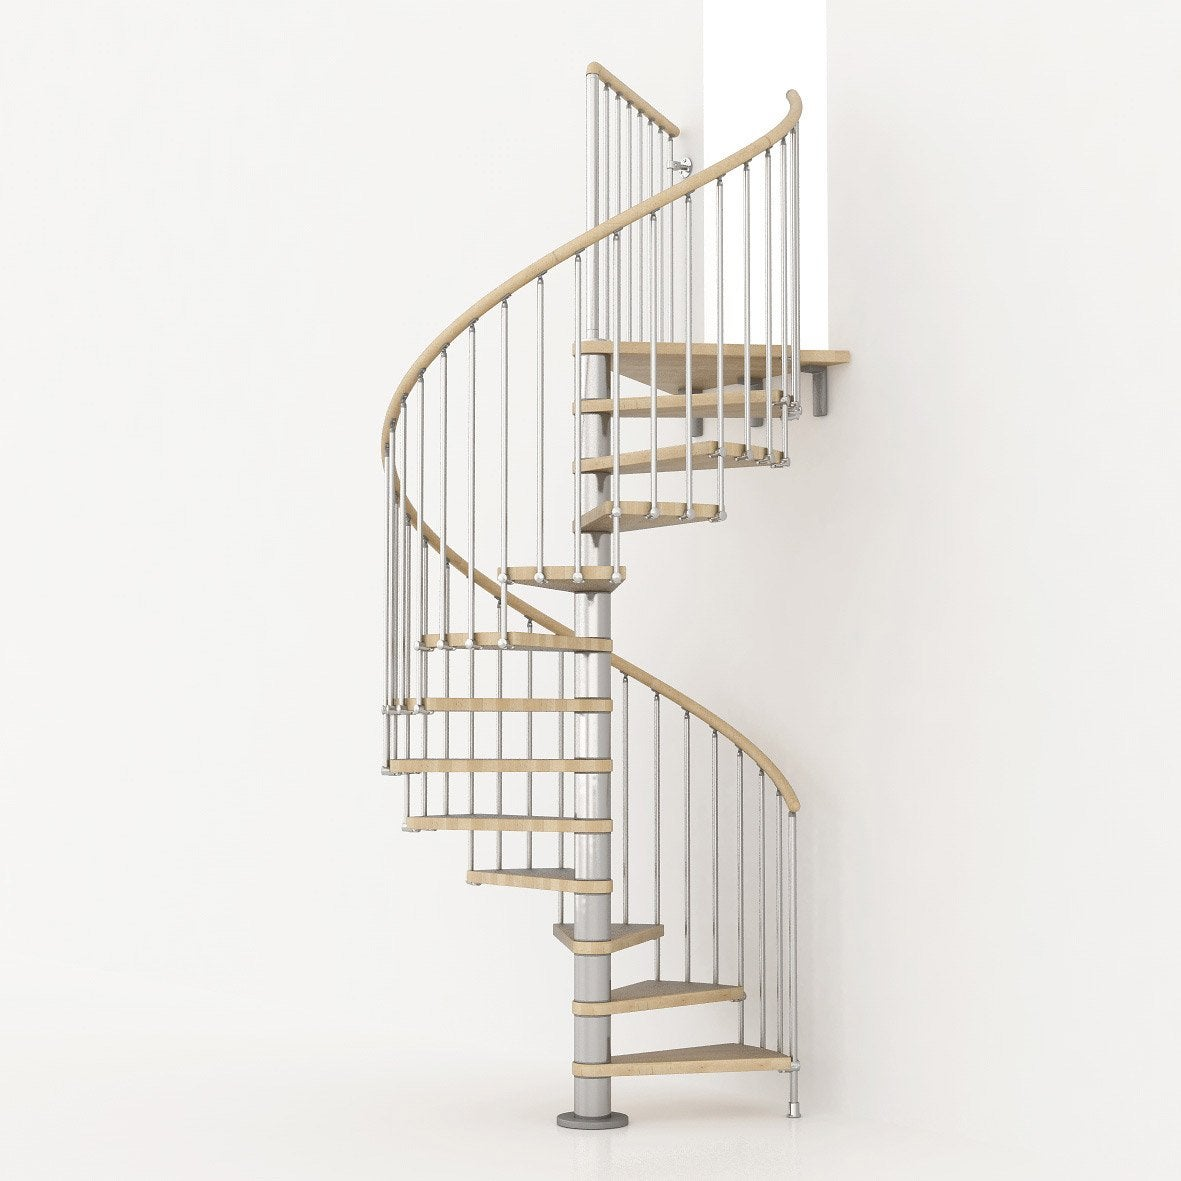 escalier colima on rond ring structure m tal marche bois leroy merlin. Black Bedroom Furniture Sets. Home Design Ideas